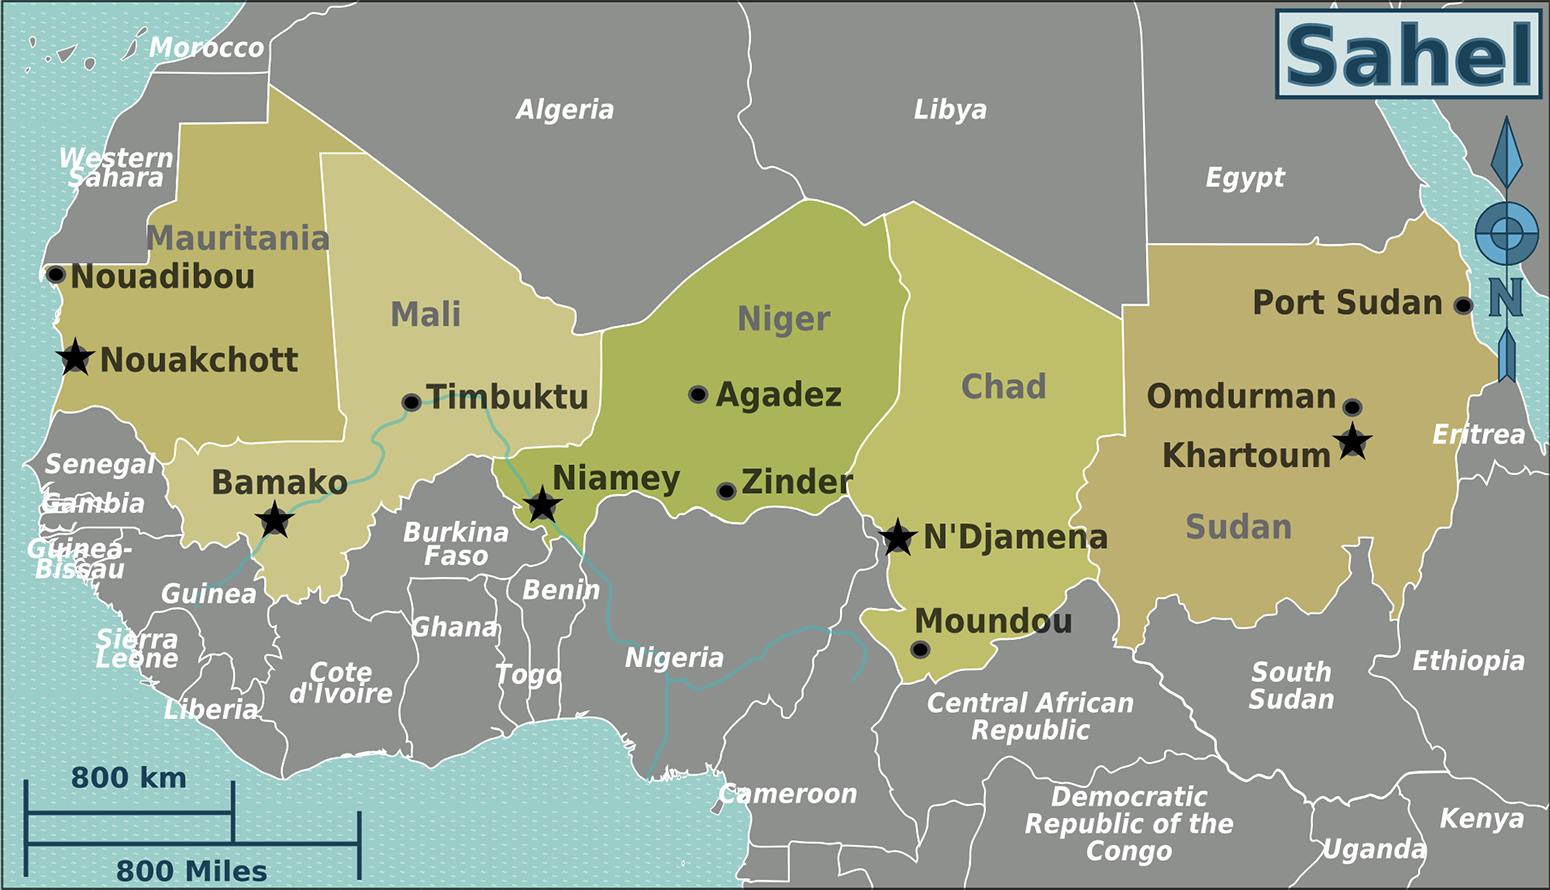 Sahel region   Africa, Africa map, Sahel region